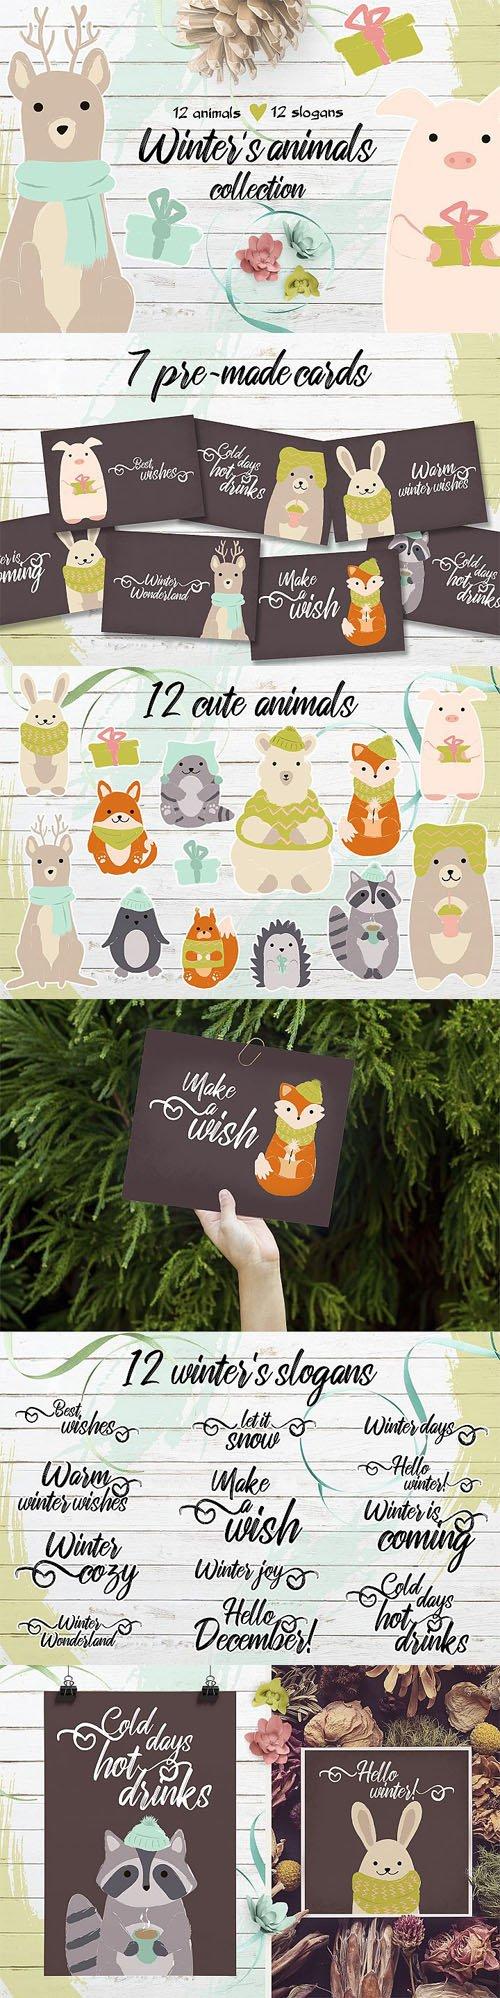 Designbundles - Winter's Cute Animals